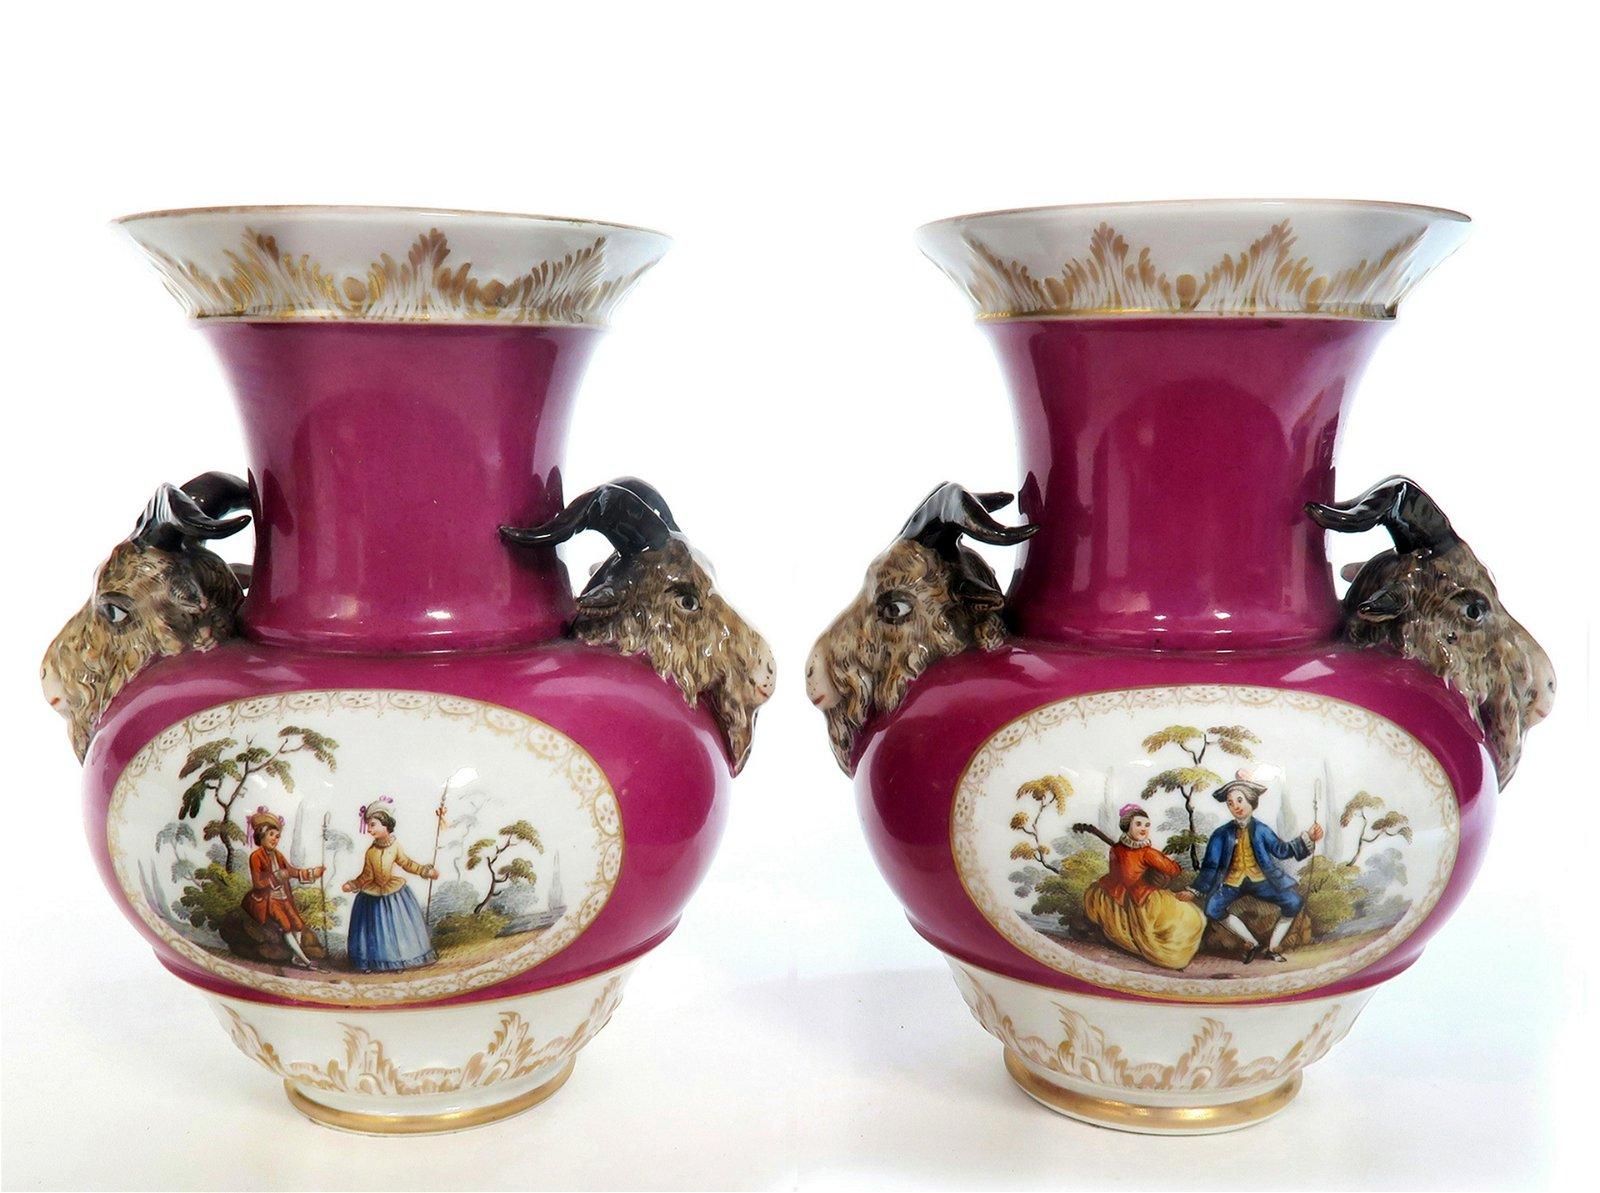 Pair Of 19th C. Berlin KPM Vases